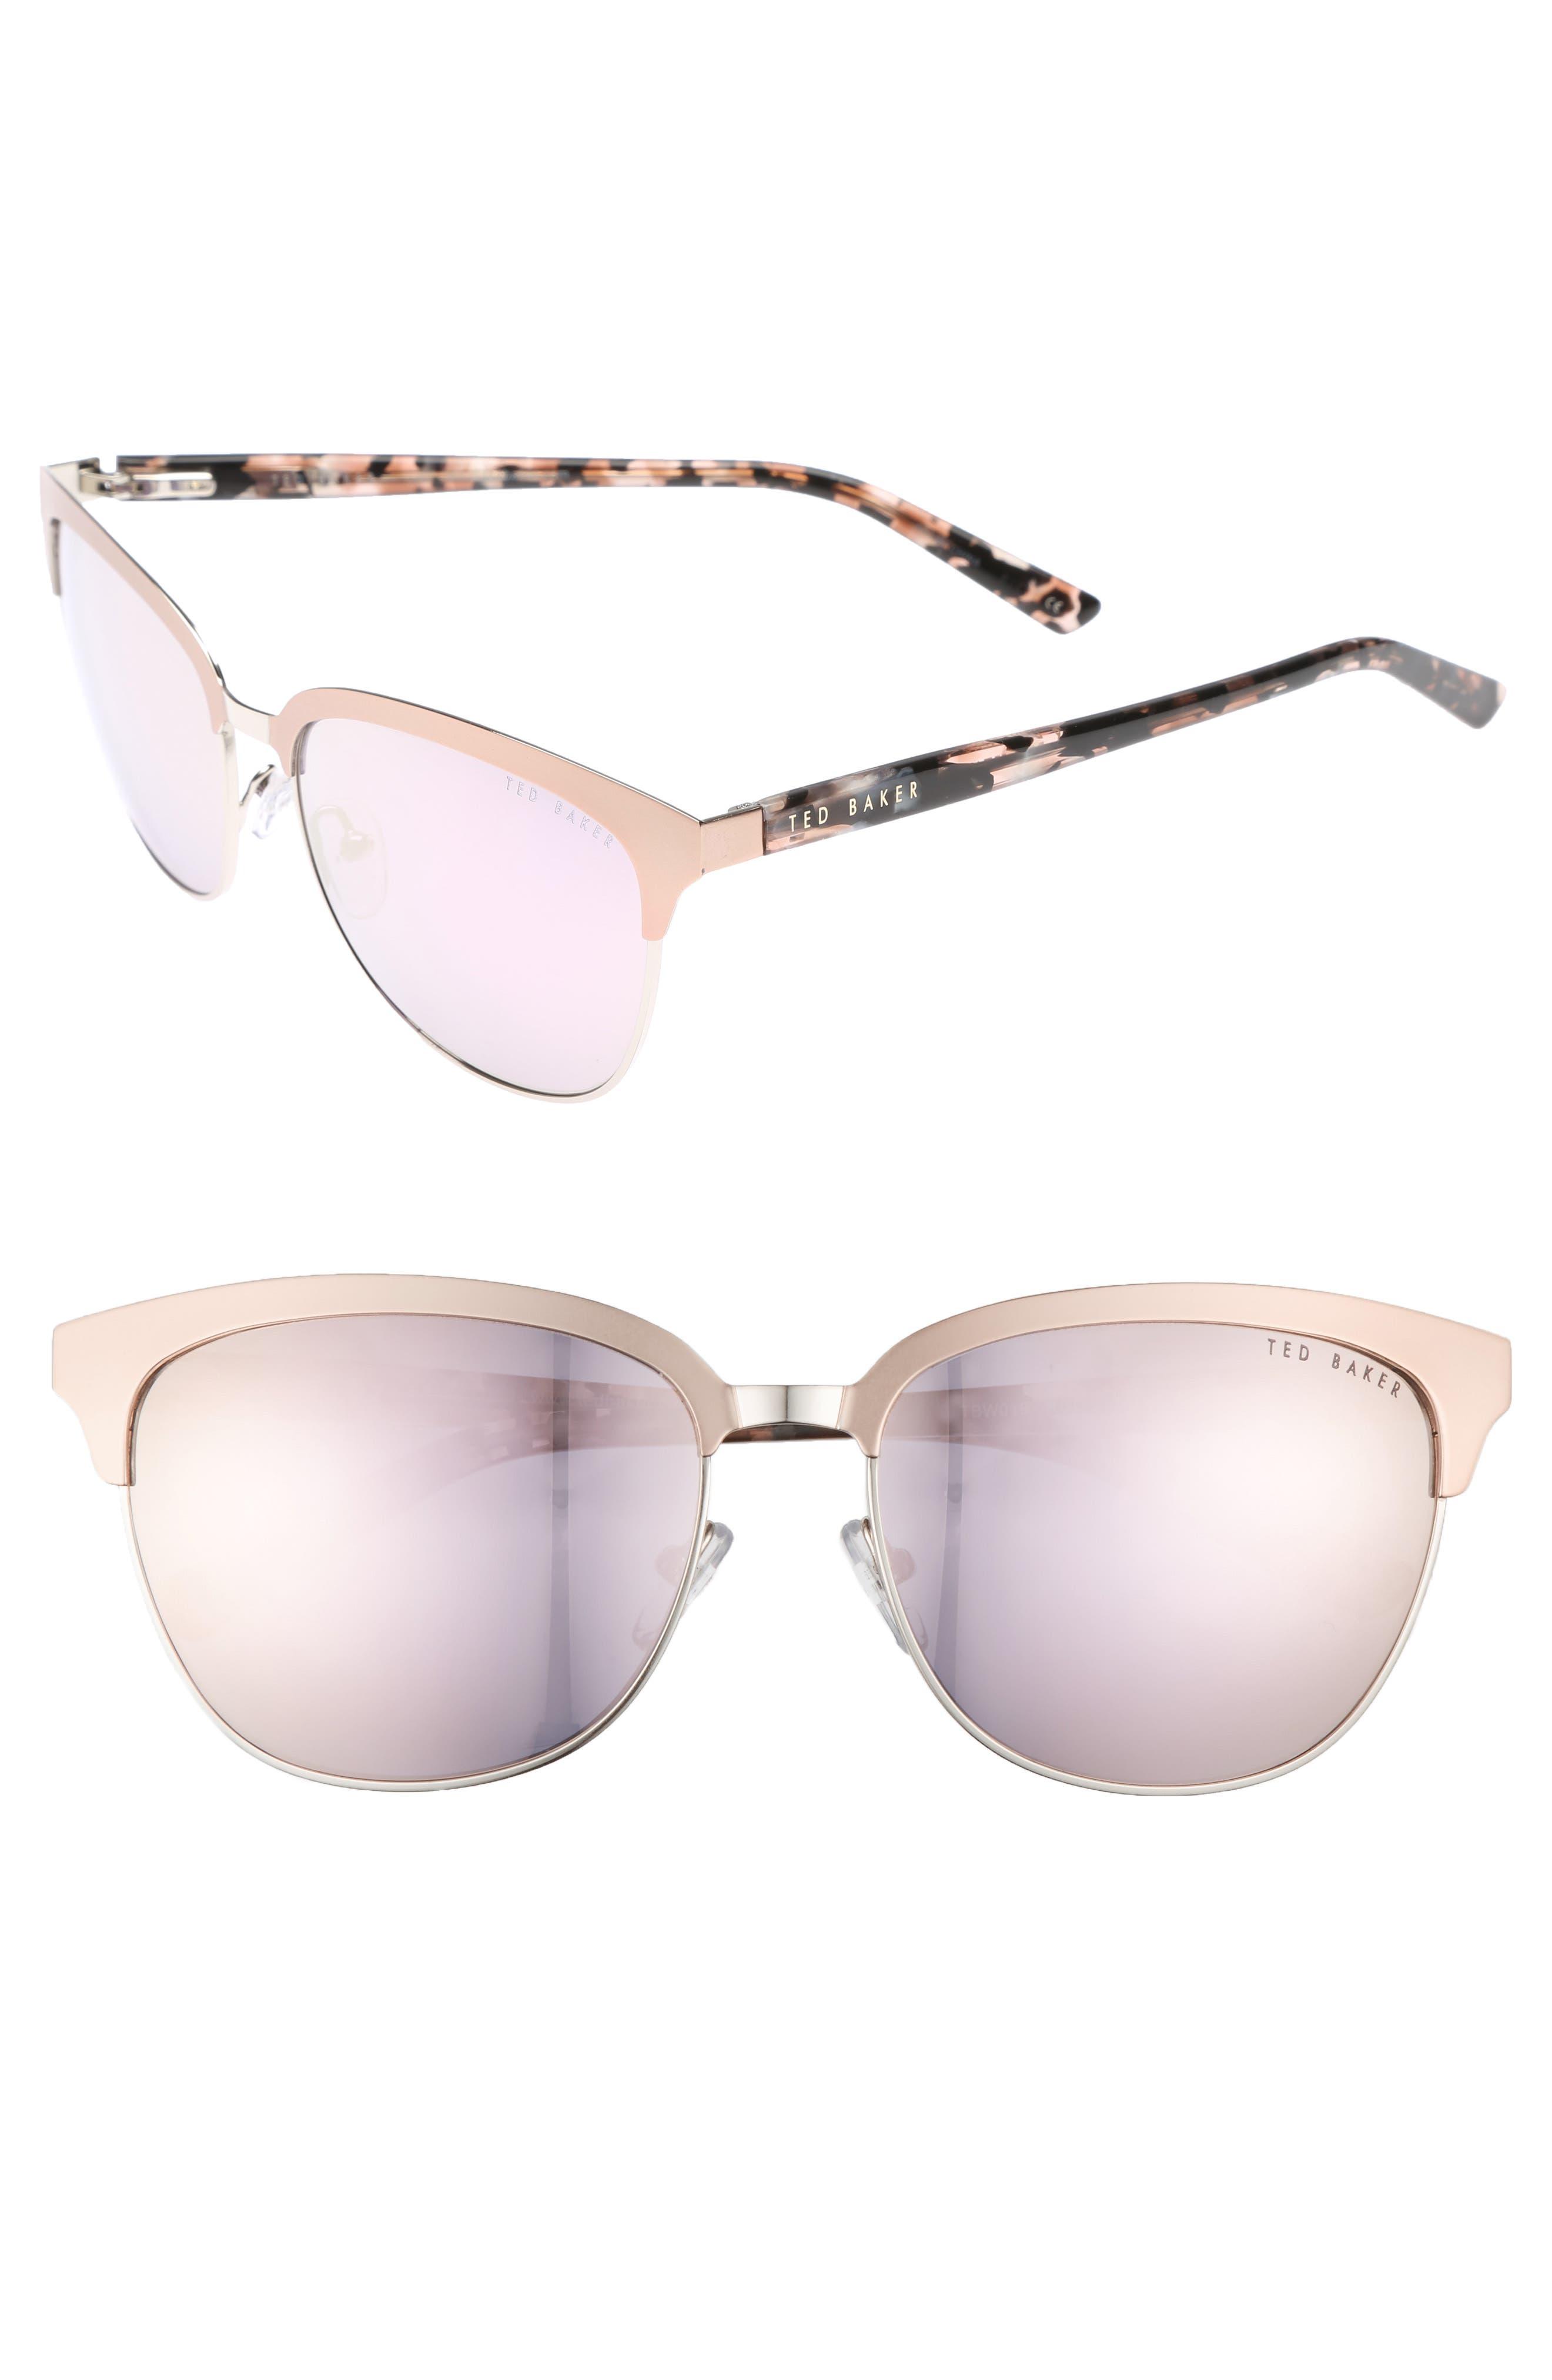 Alternate Image 1 Selected - Ted Baker London 57mm Mirrored Sunglasses